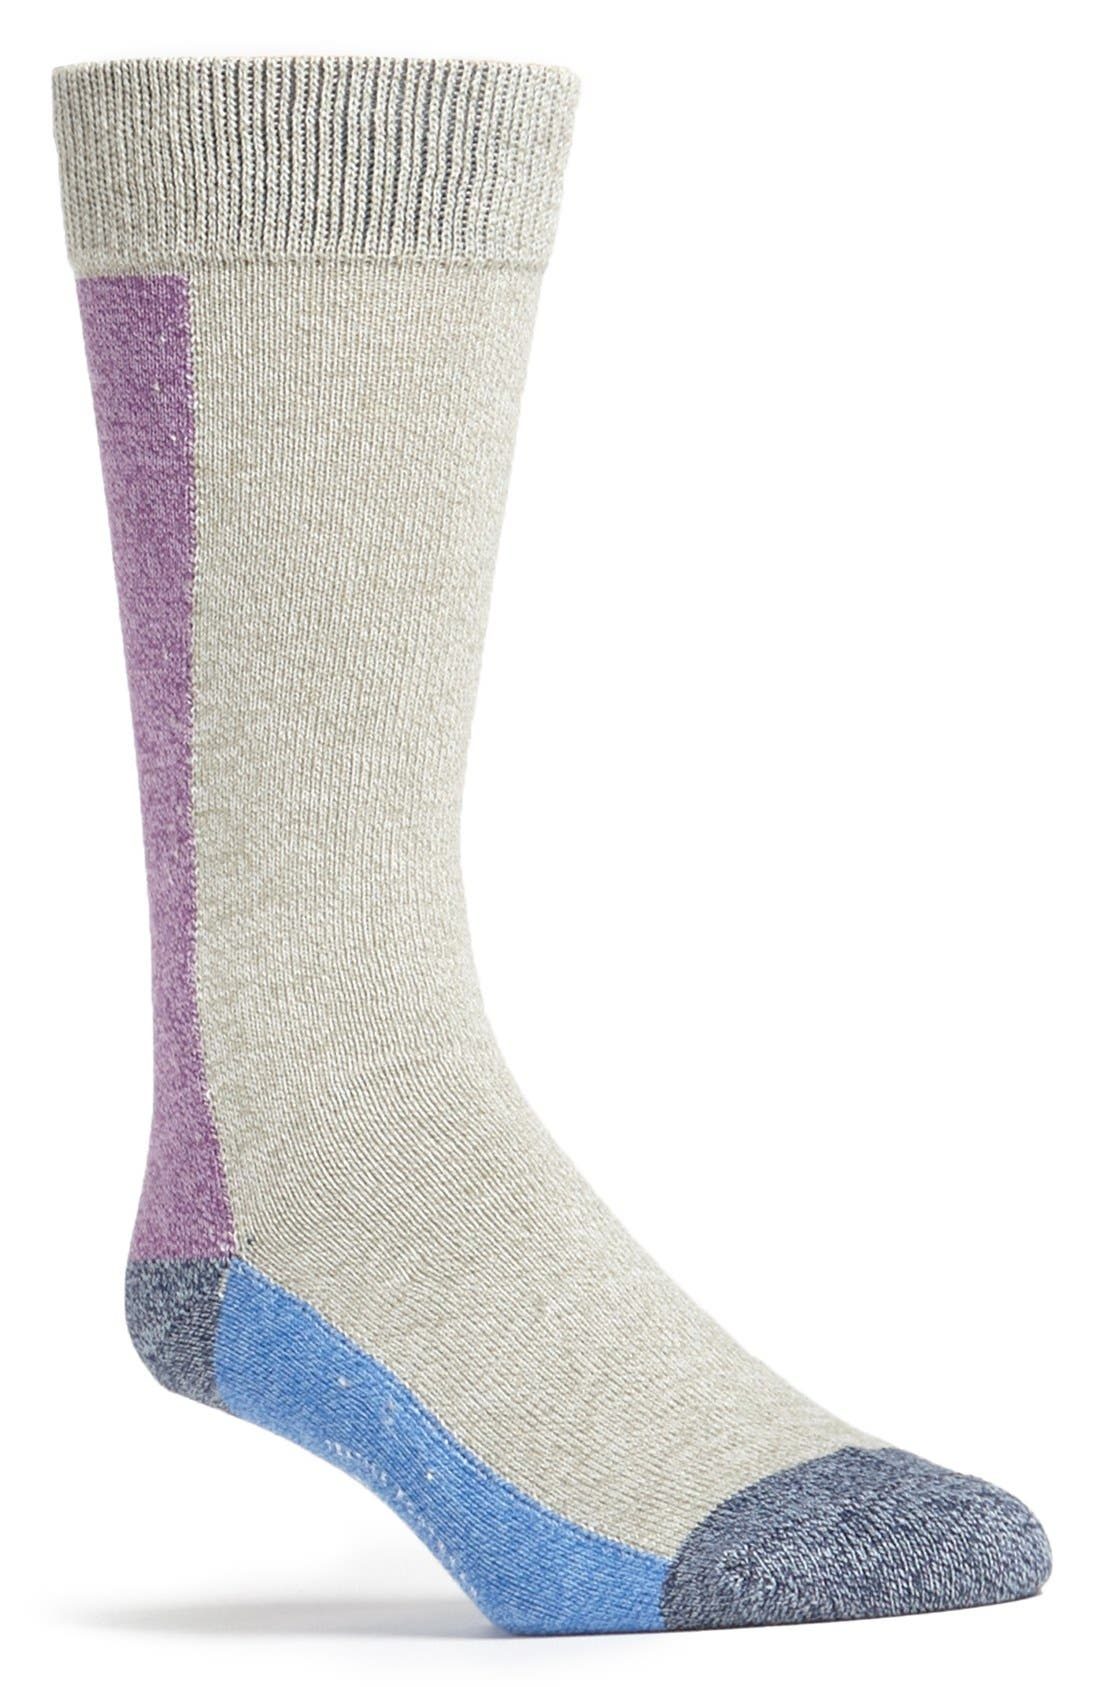 Alternate Image 1 Selected - Mr. Gray Colorblock Socks